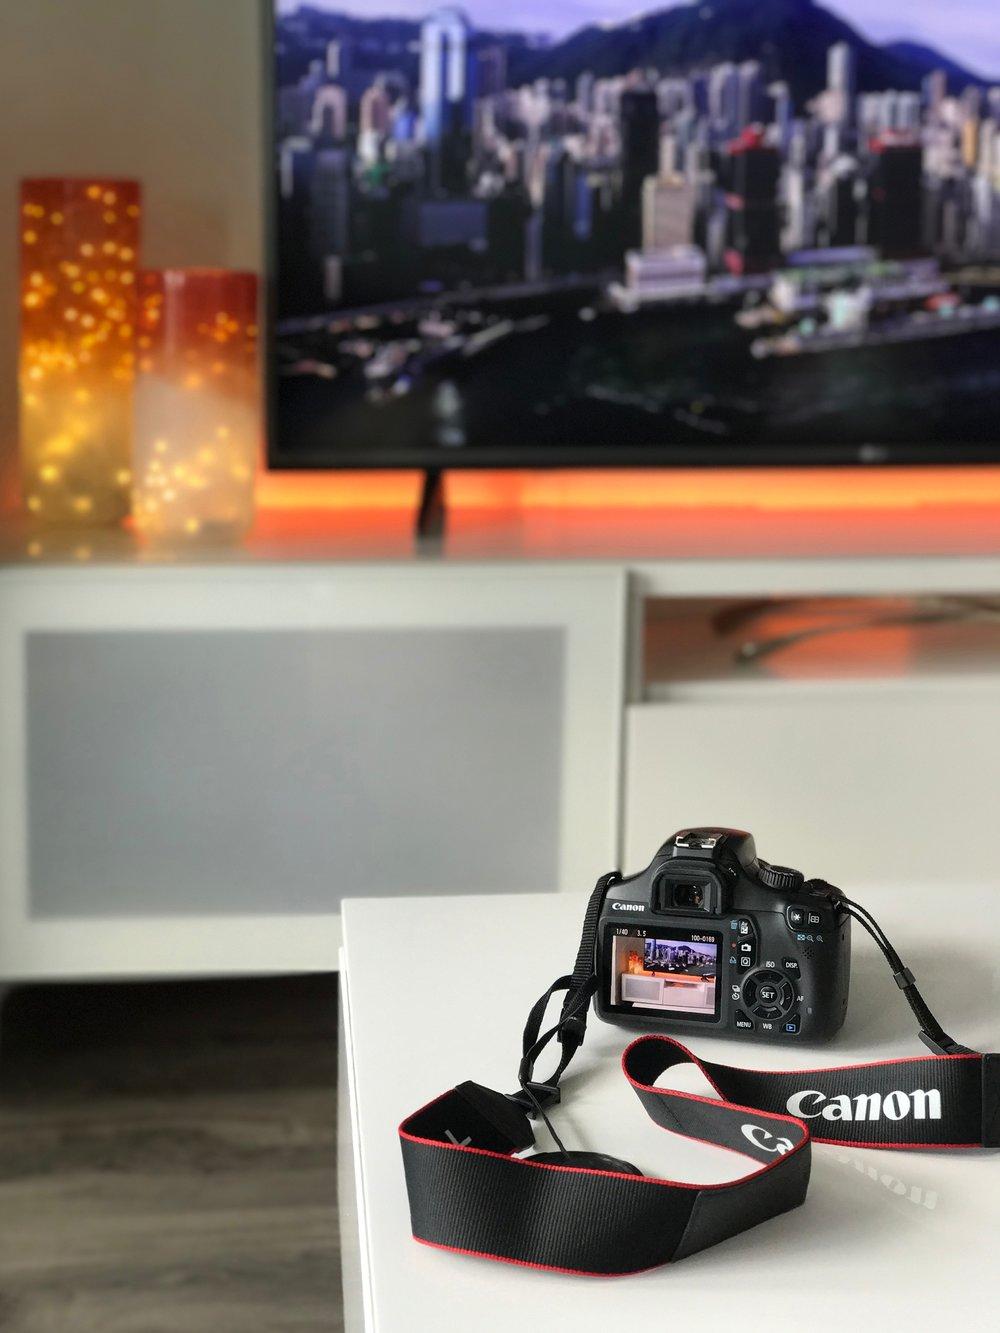 renters-insurance-tv-camera